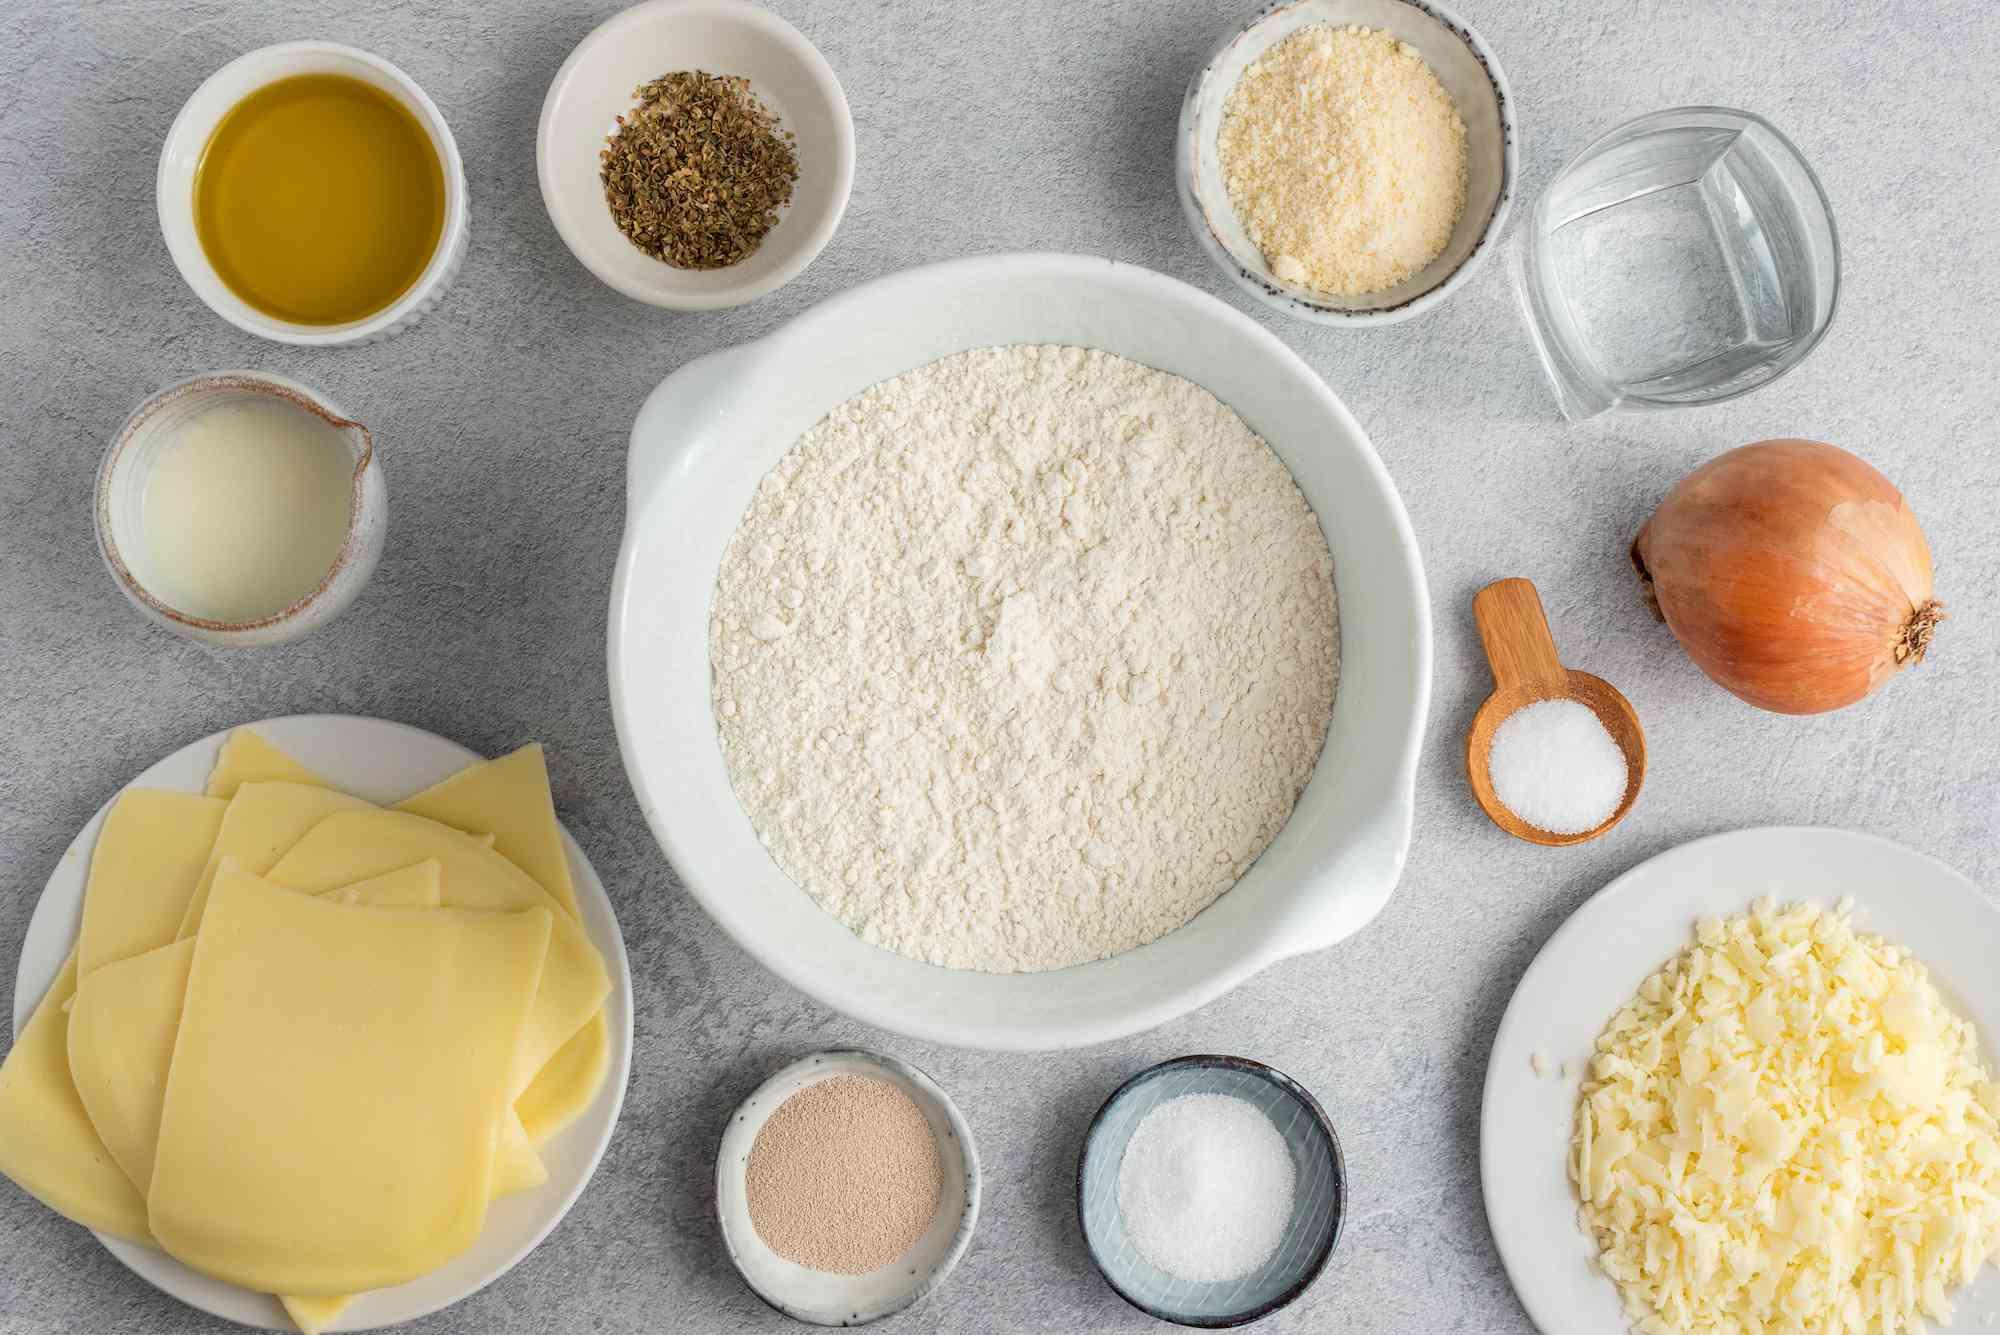 Ingredients for Fugazzeta